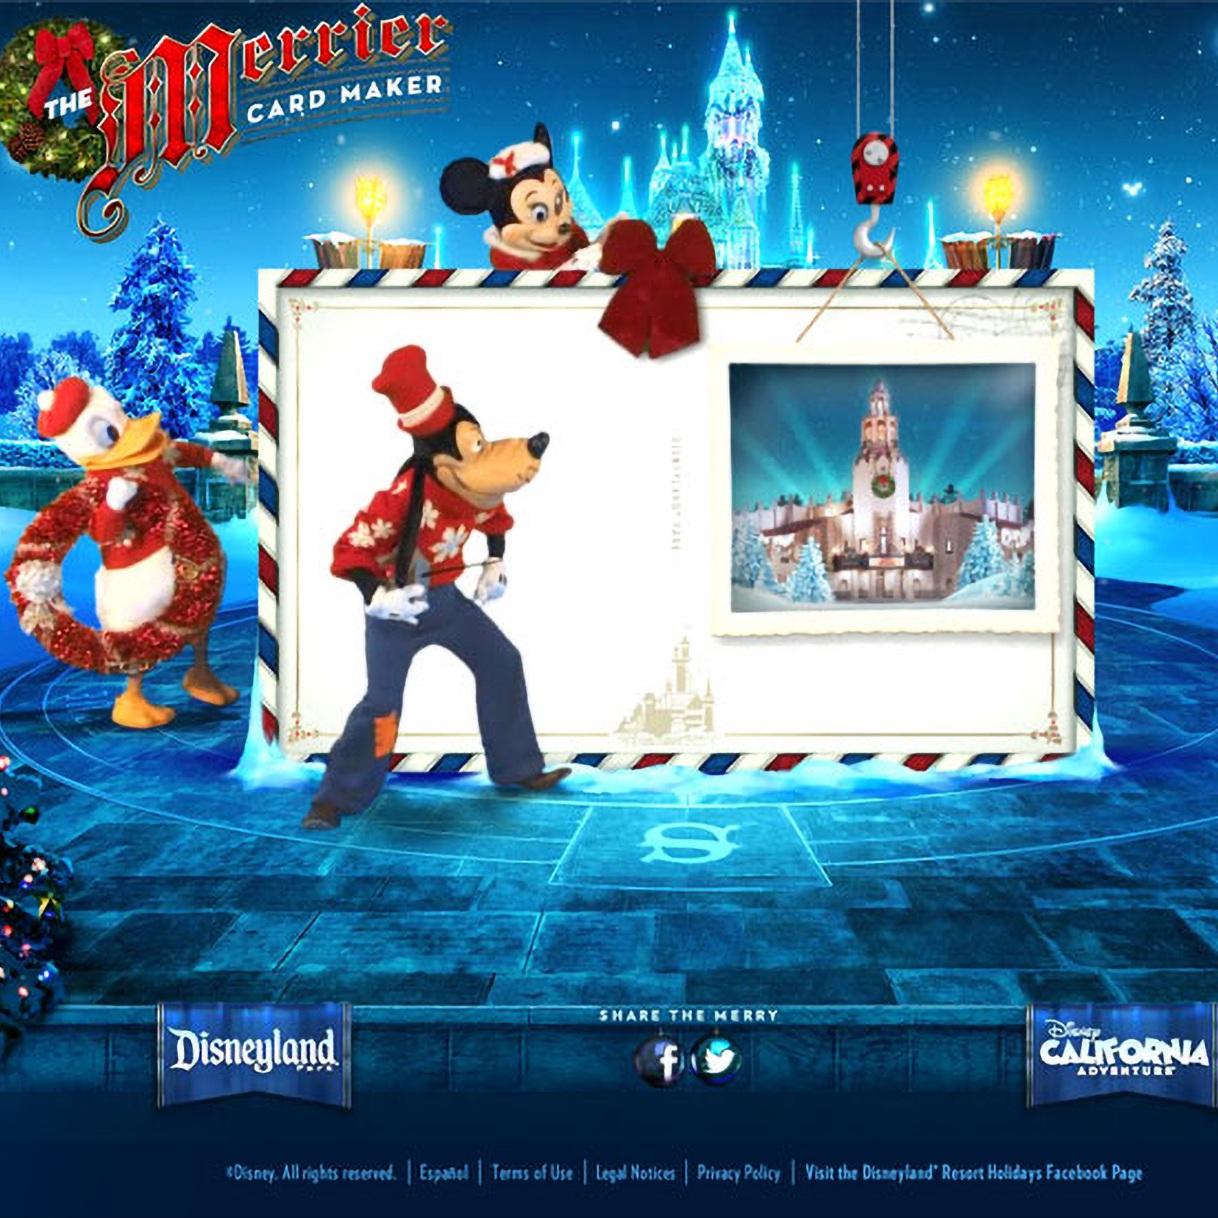 CREDIT-Disneyland-Holiday-Card.jpg